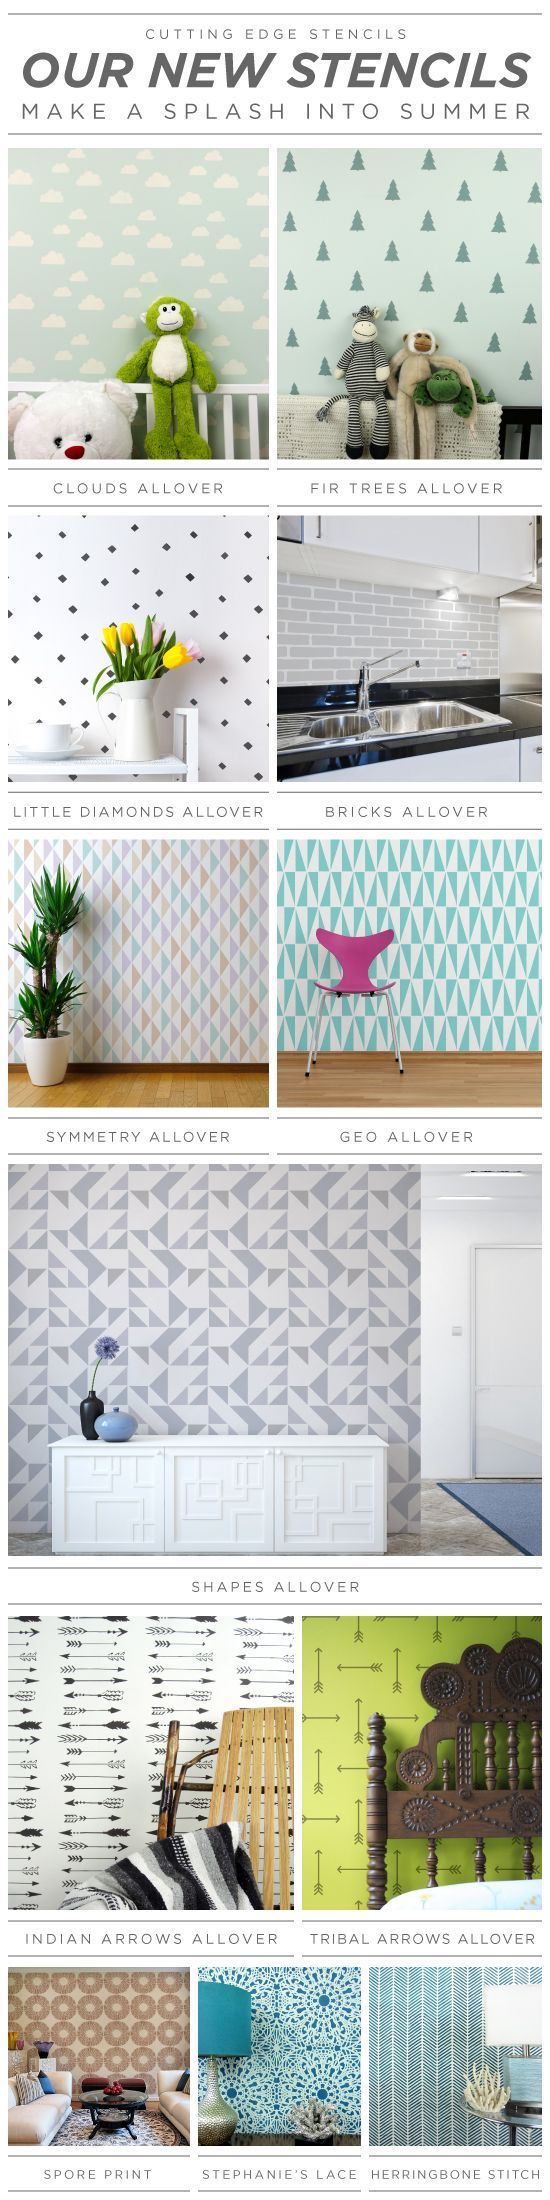 New wall stencil patterns from Cutting Edge Stencils. http://www.cuttingedgestencils.com/wall-stencils-stencil-designs.html